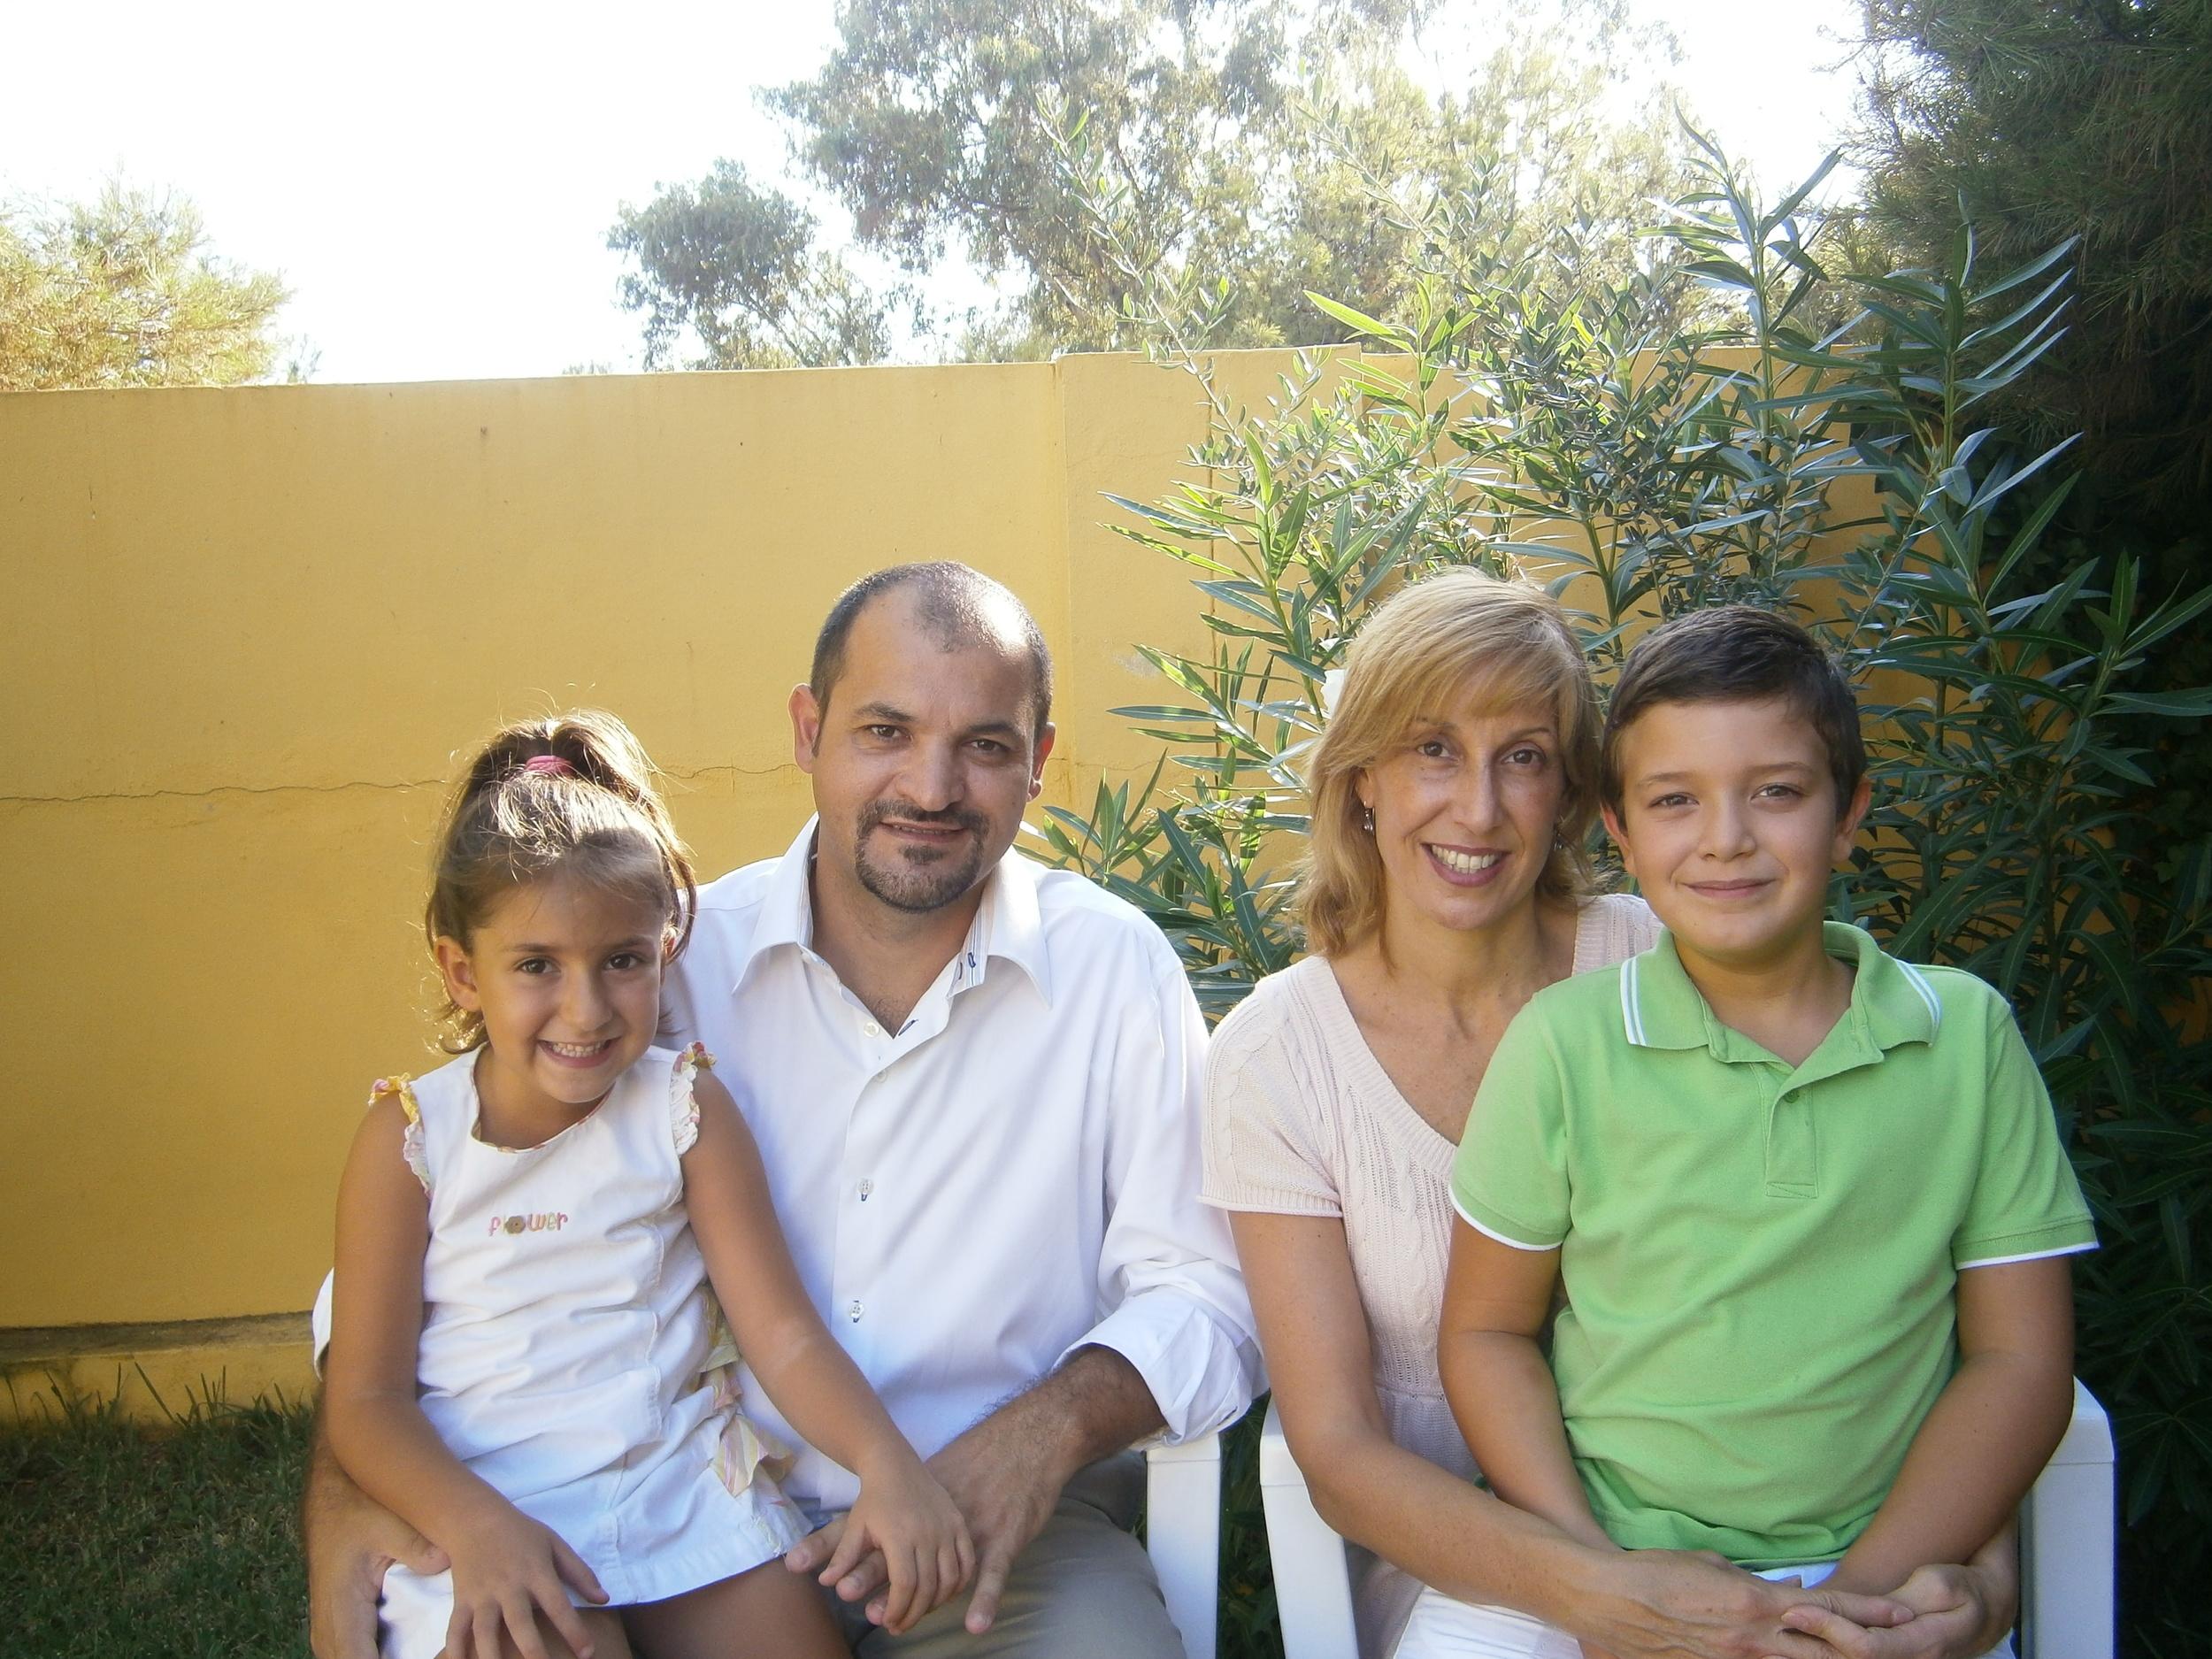 Pablo, Rosa, Yoel, & Lidia